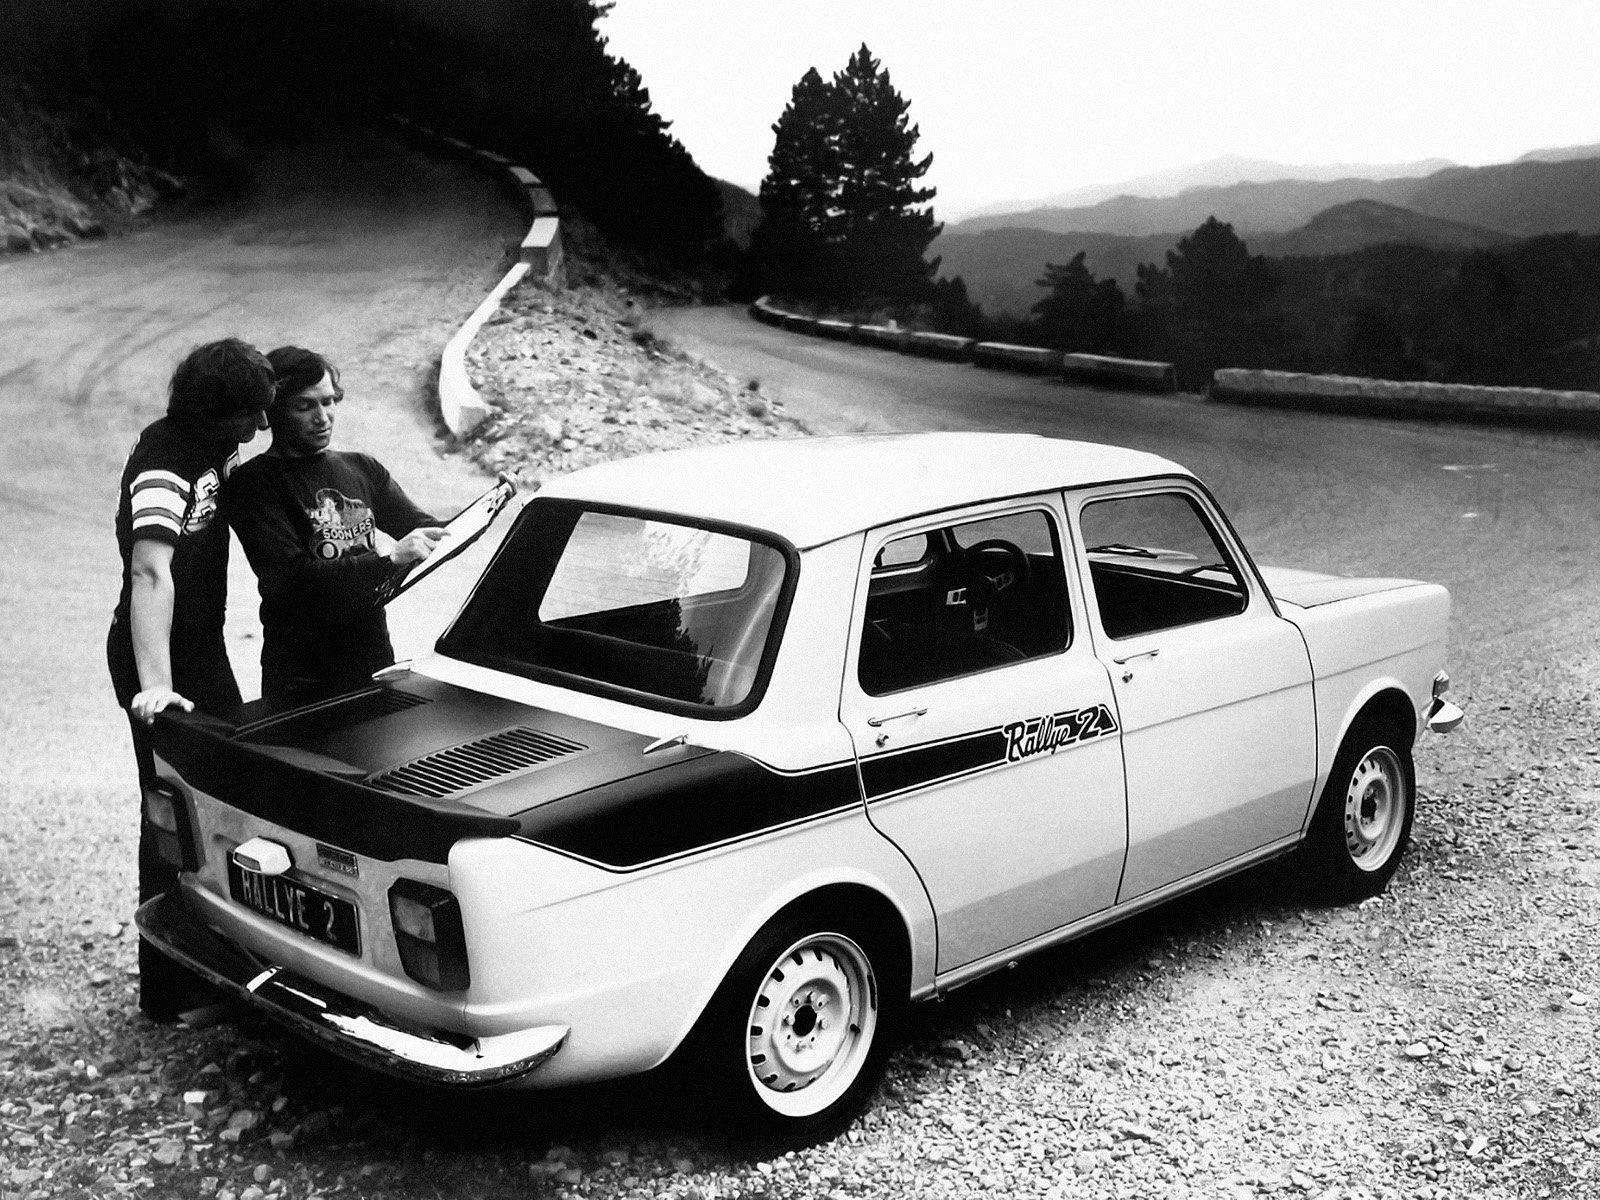 1976 simca 1000 rallye 2 g wallpaper 1600x1200 298210. Black Bedroom Furniture Sets. Home Design Ideas